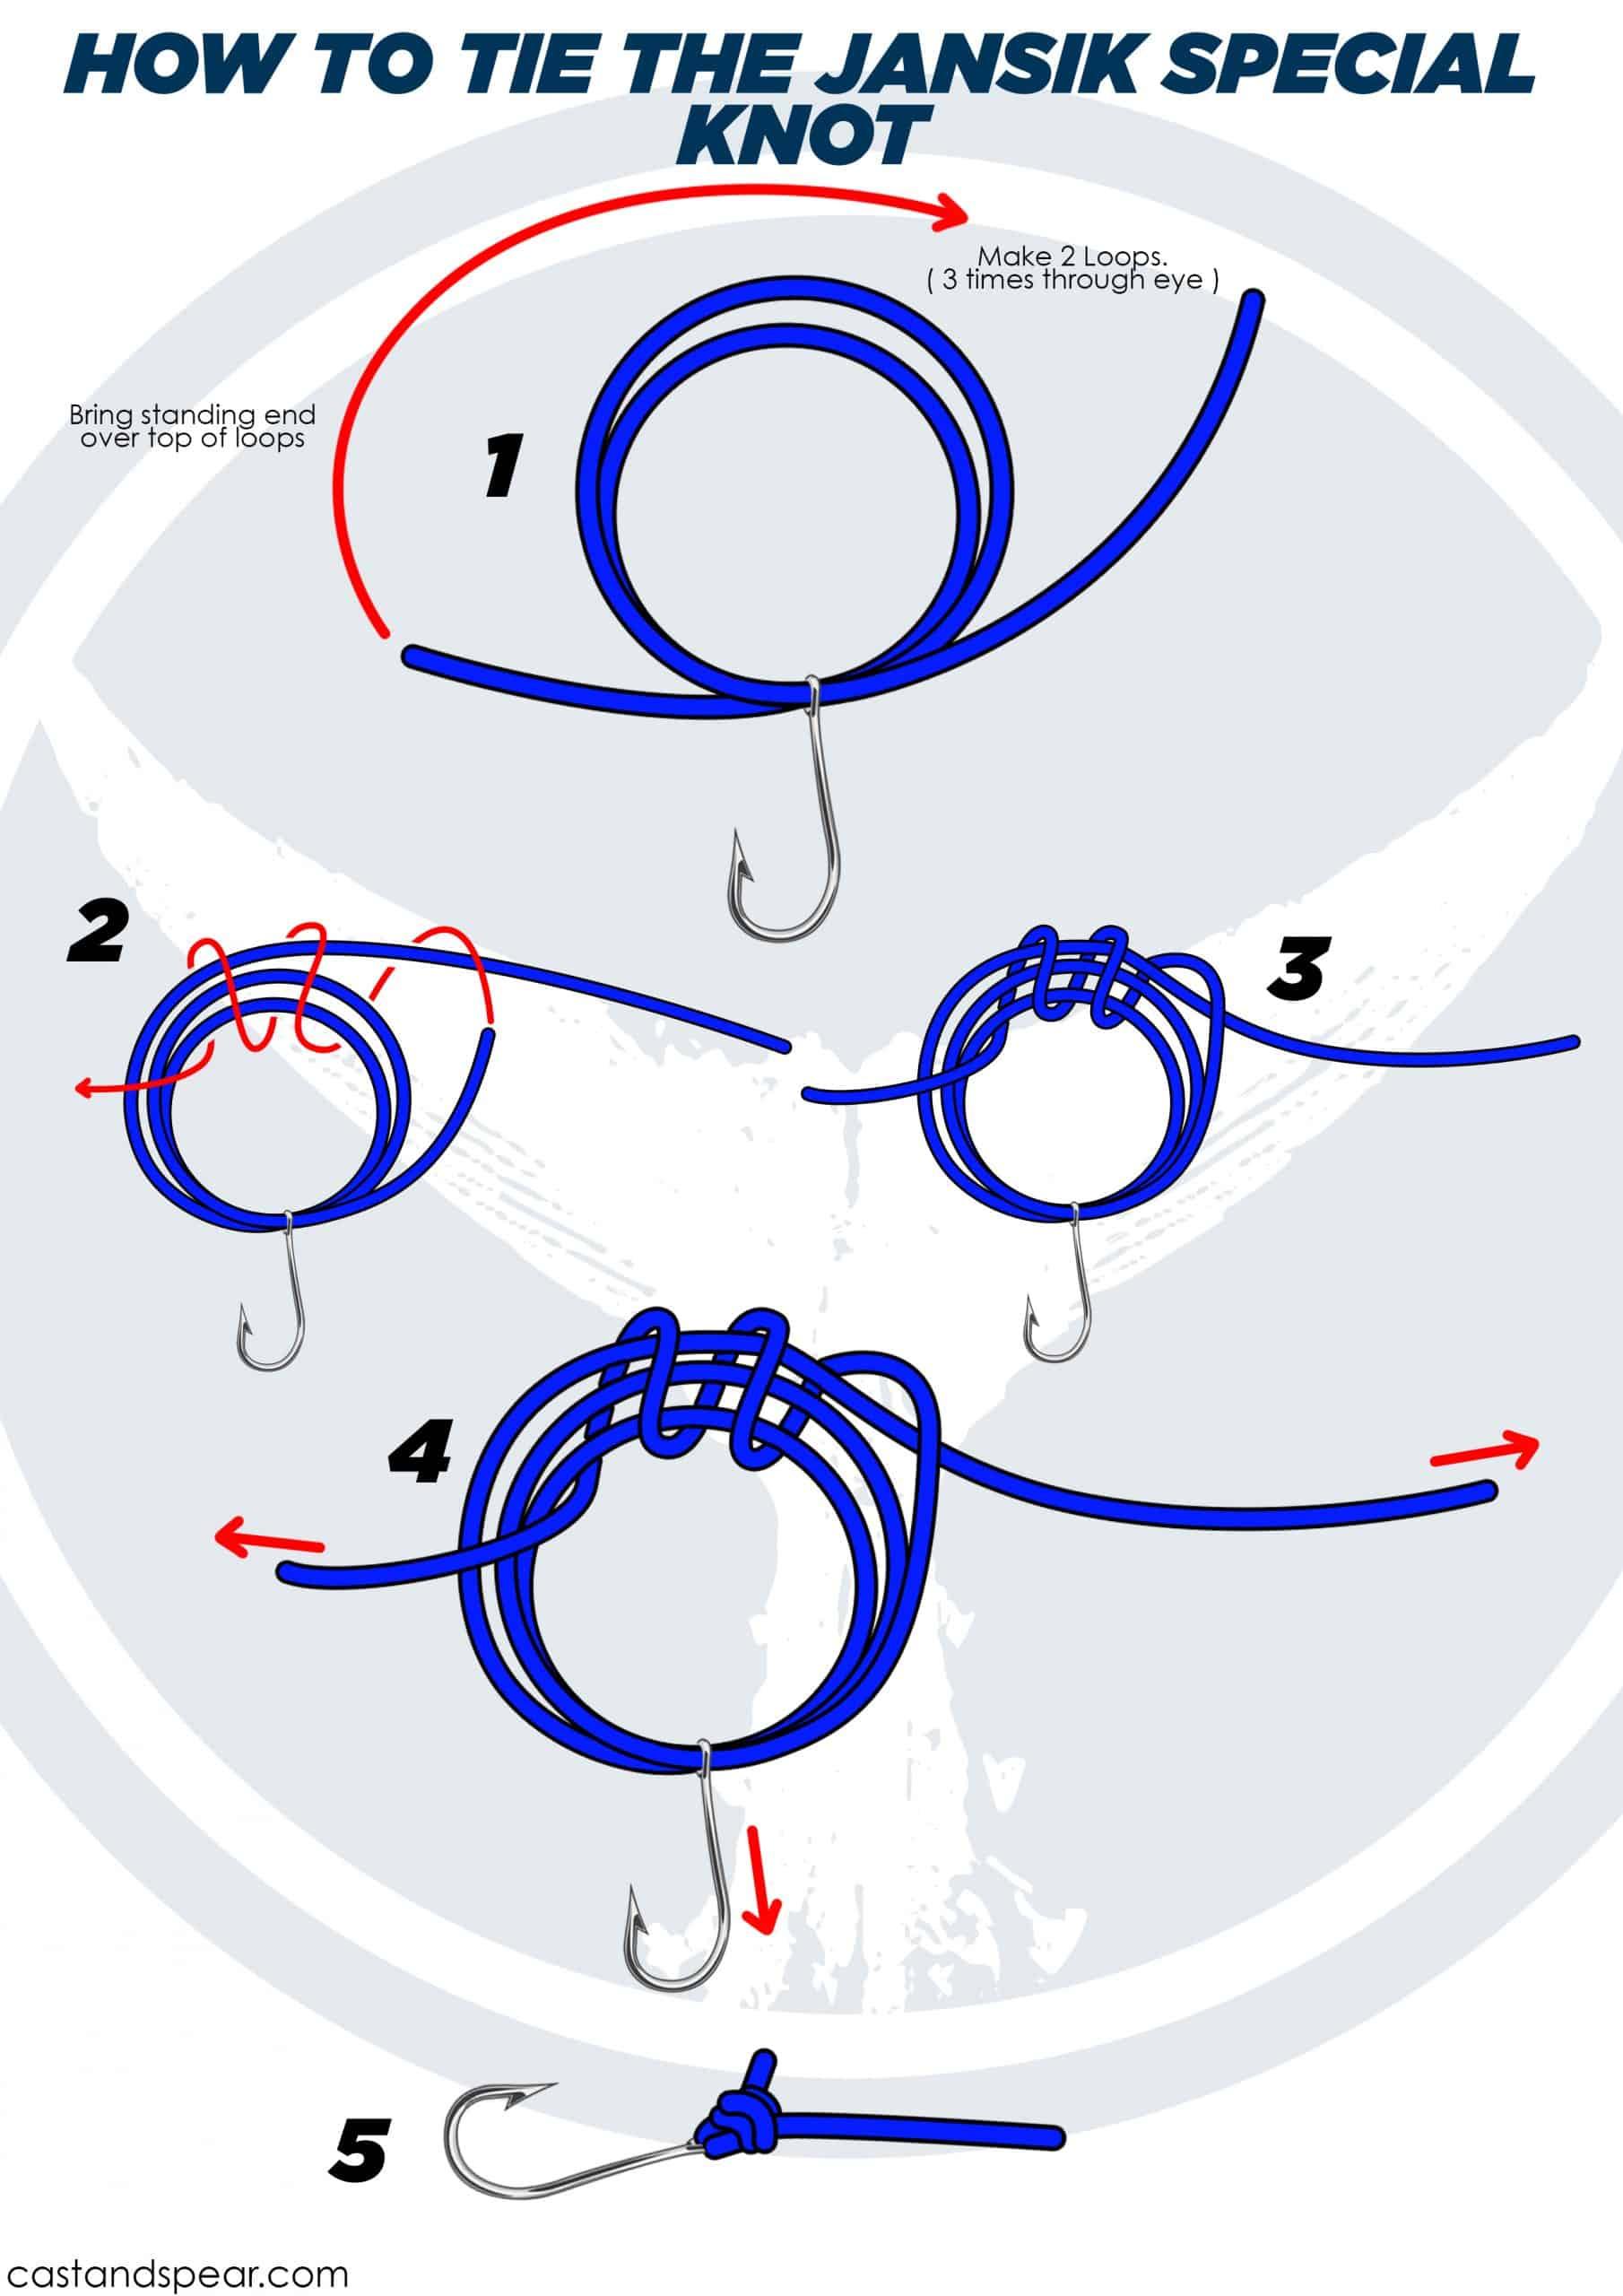 Jansik Special Knot